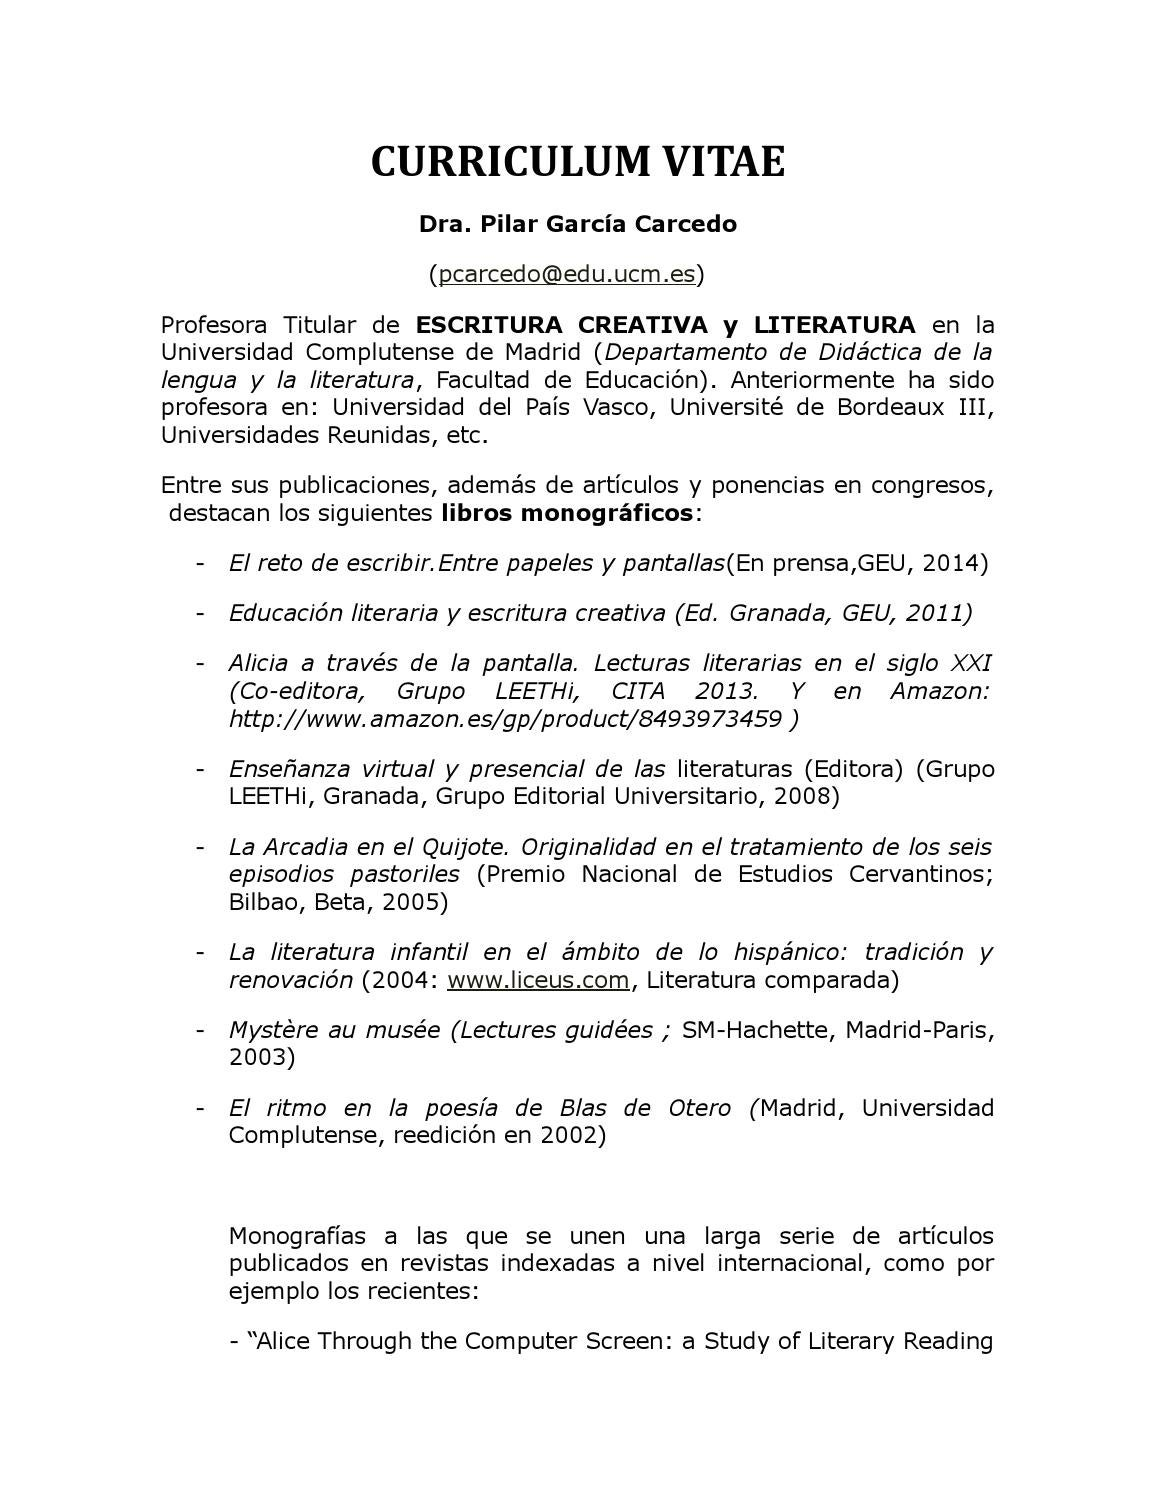 Pilar garcía carcedo cv breve 2015 by Pilar García Carcedo - issuu